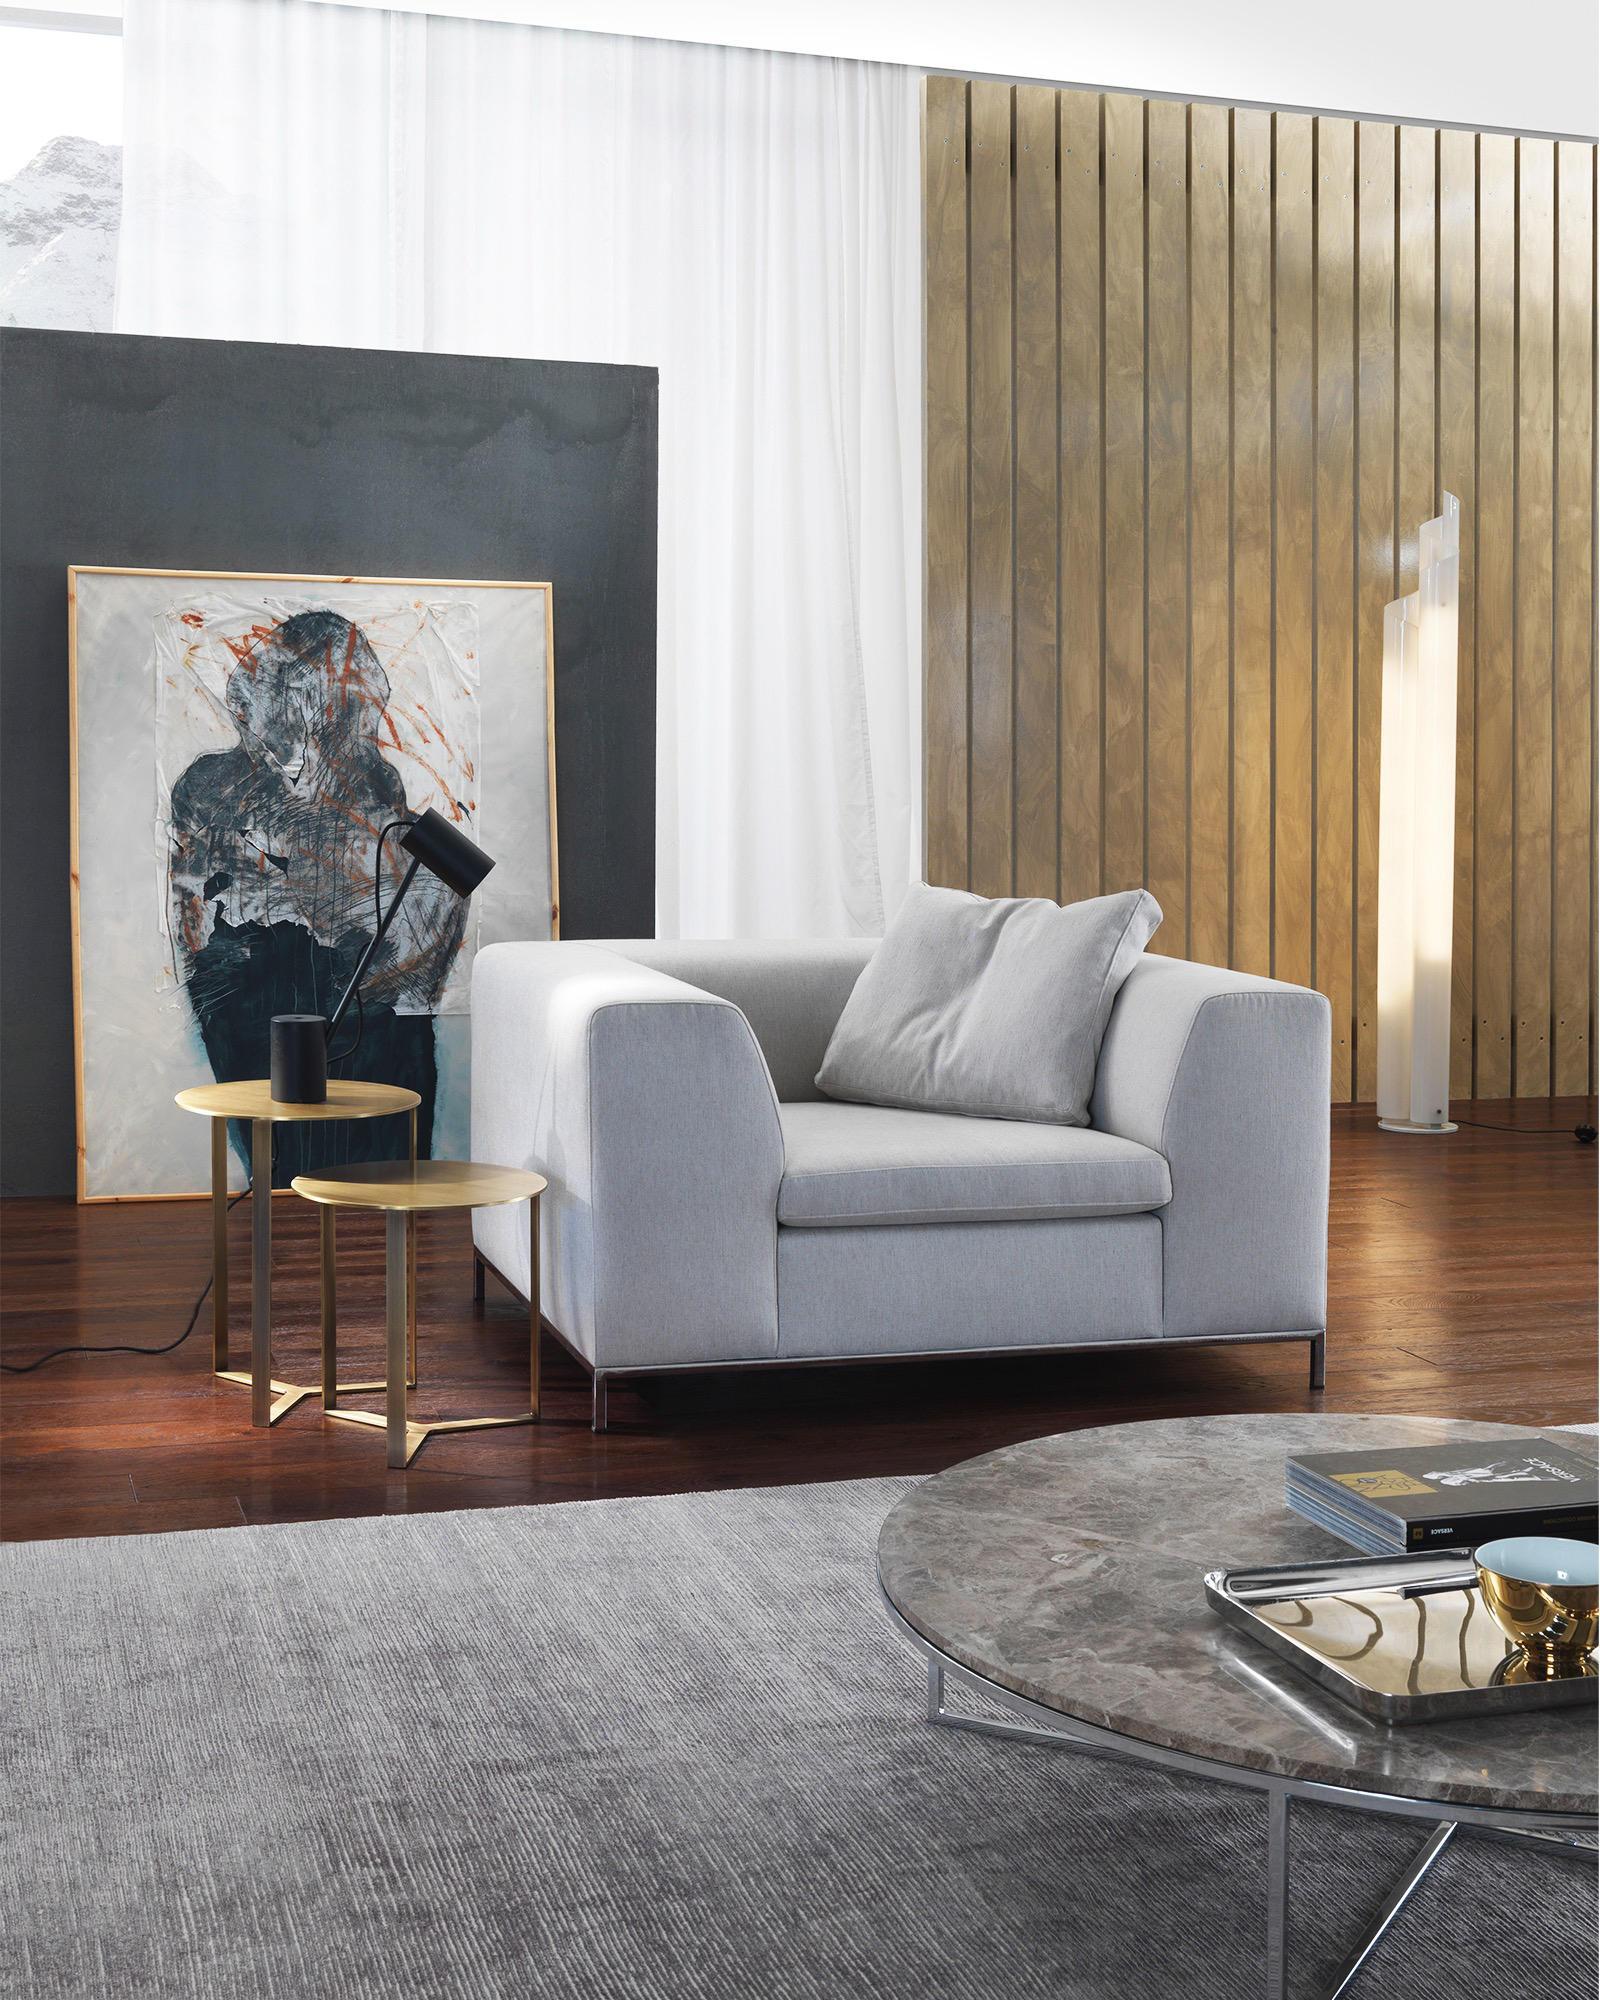 Leather Sofas Nyc: NEW YORK SOFA - Sofas From Marelli